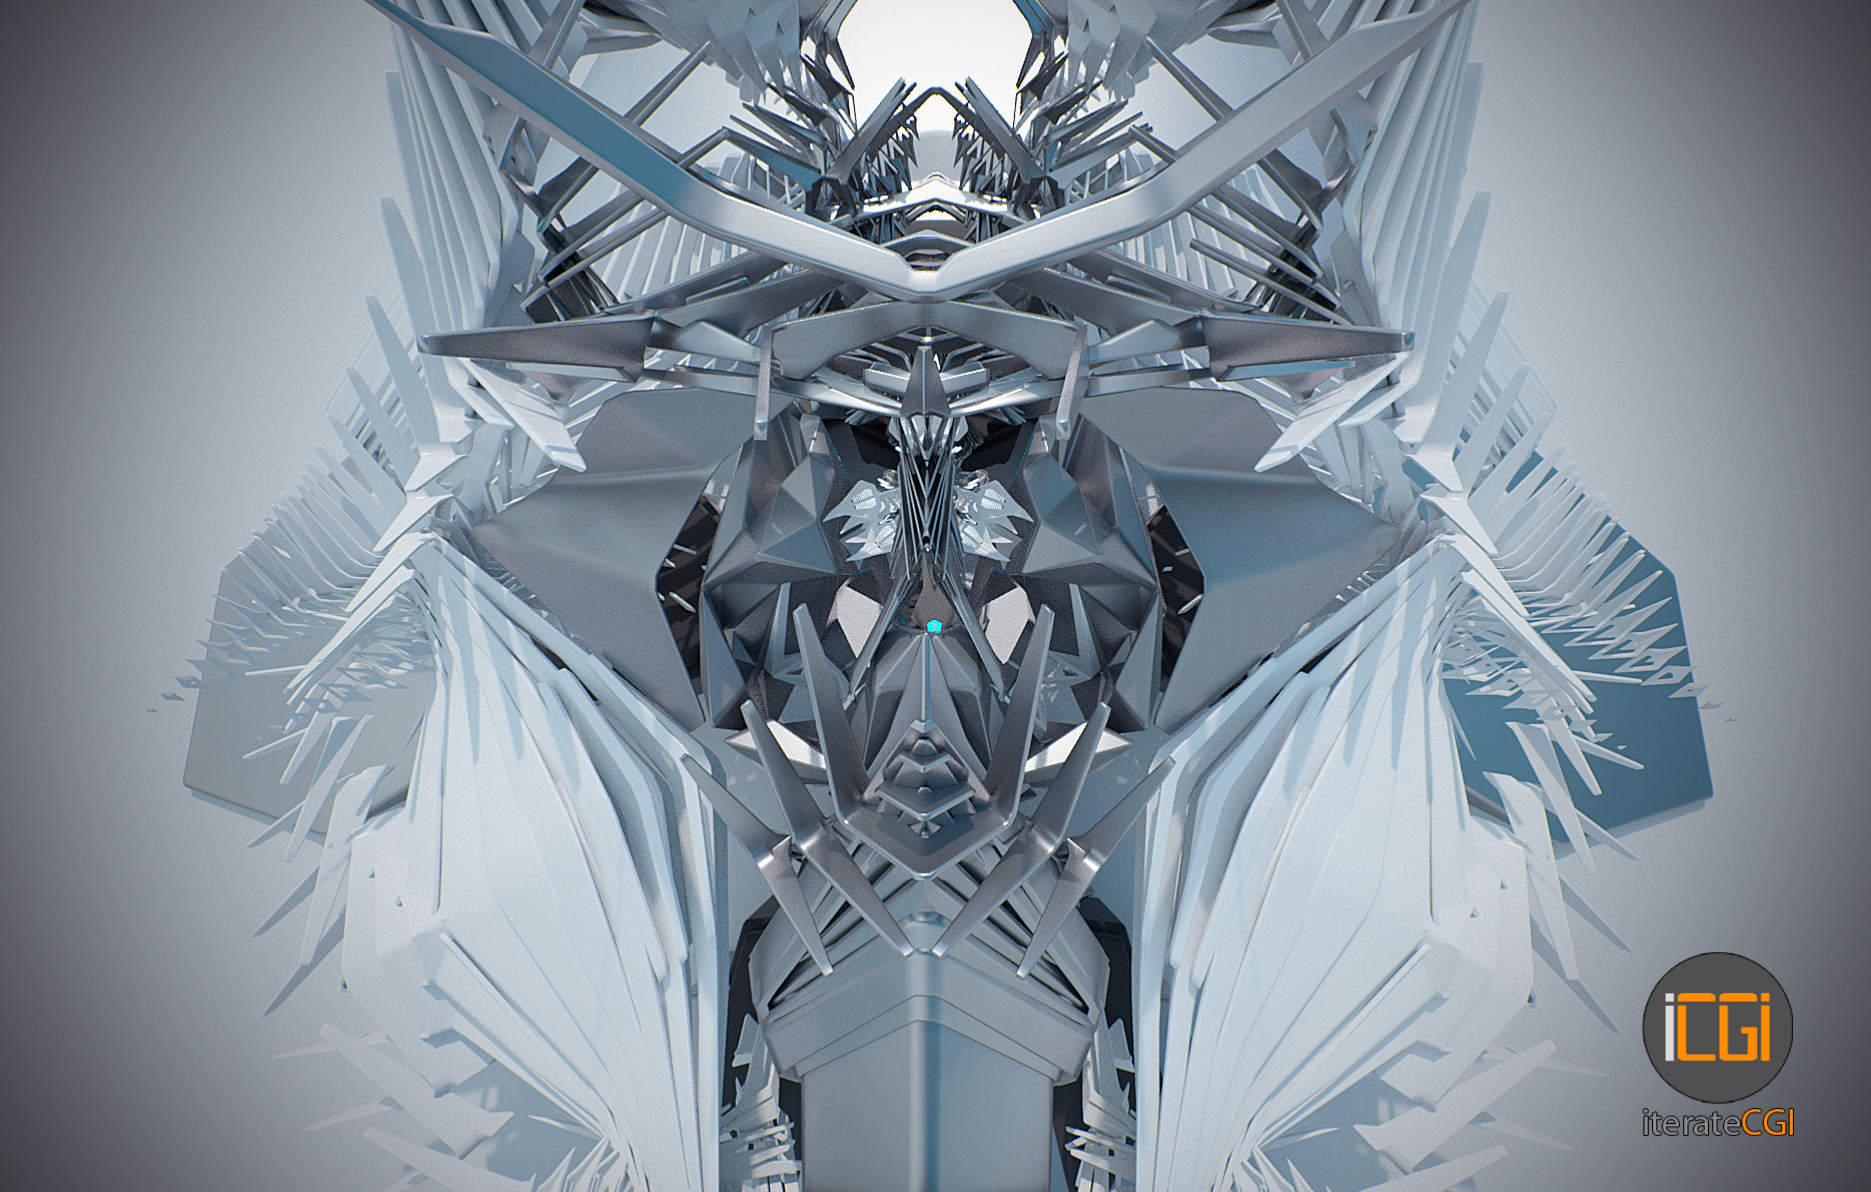 Johan de leenheer generative 3d symmetries 4